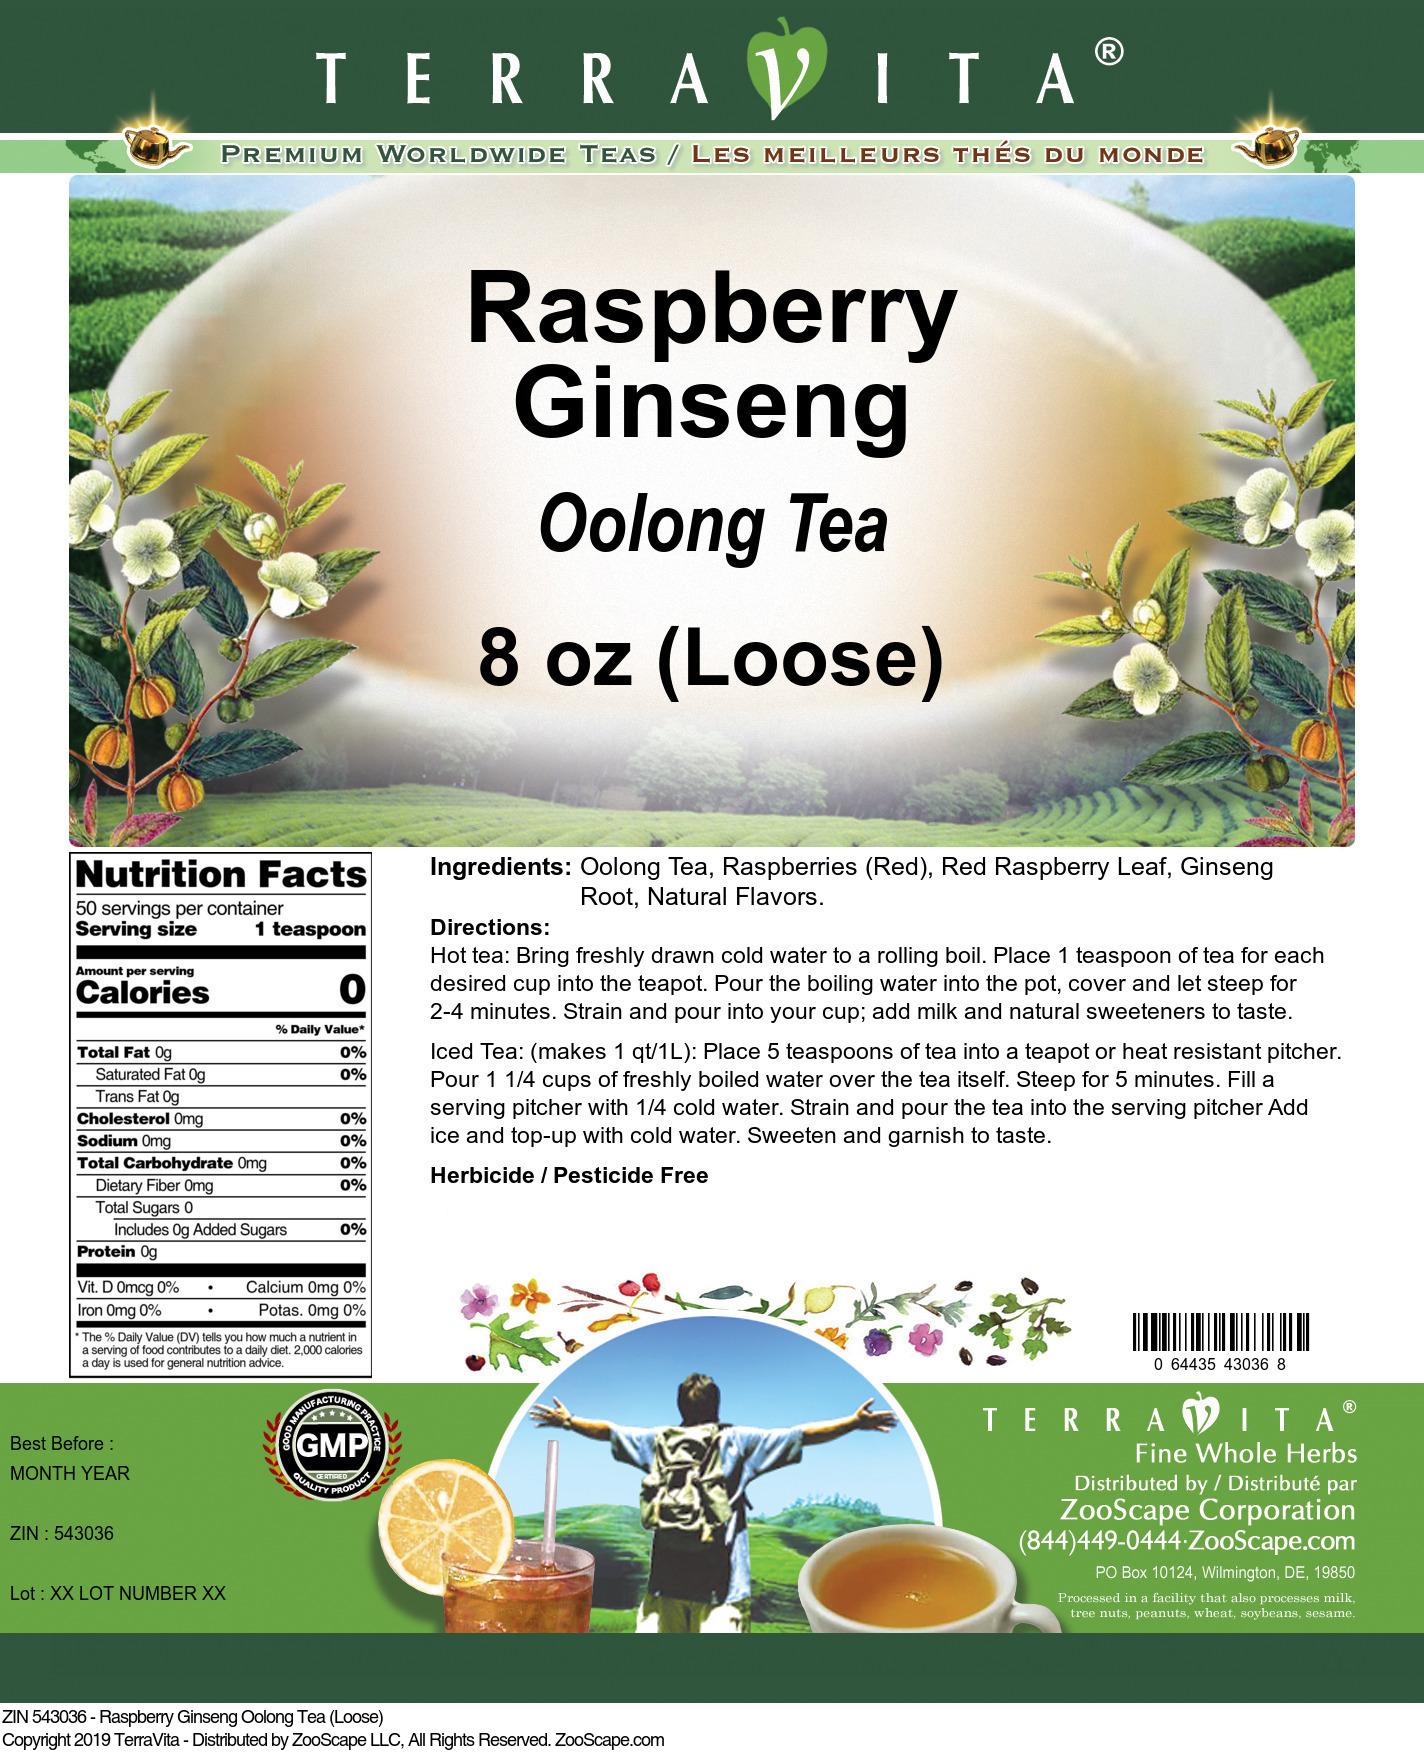 Raspberry Ginseng Oolong Tea (Loose)